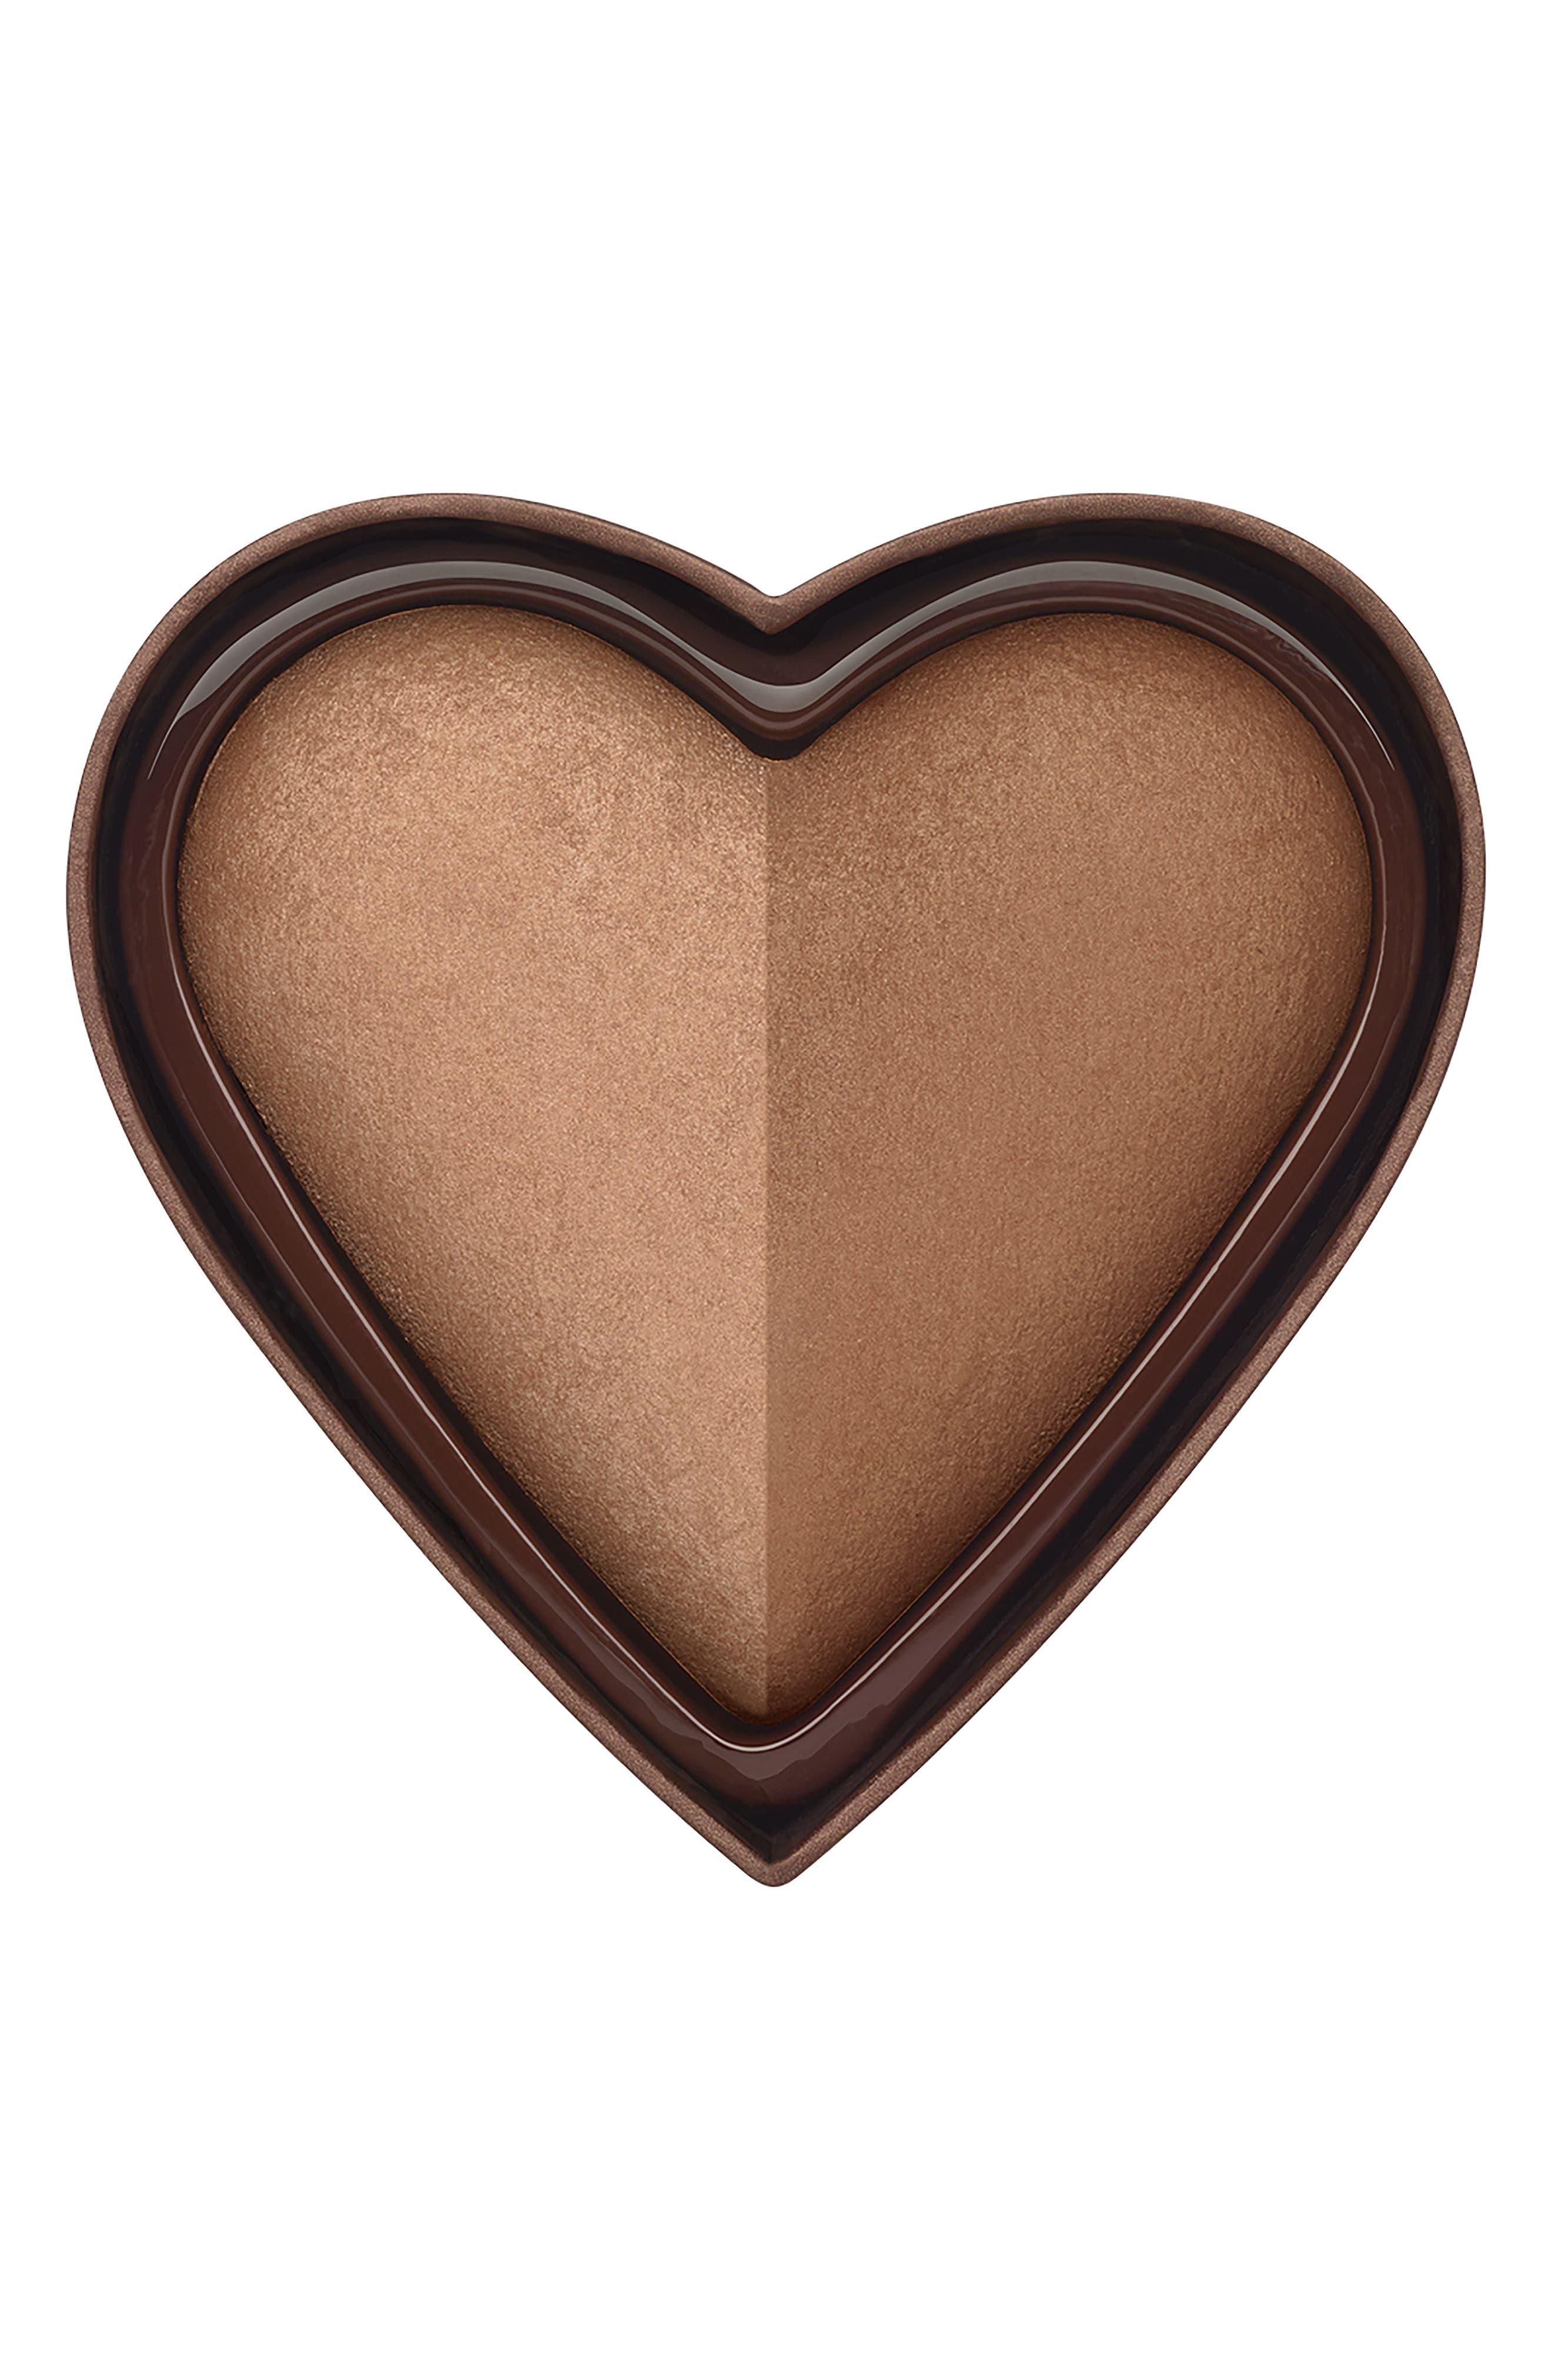 Sweethearts Bronzer,                             Main thumbnail 1, color,                             SWEET TEA